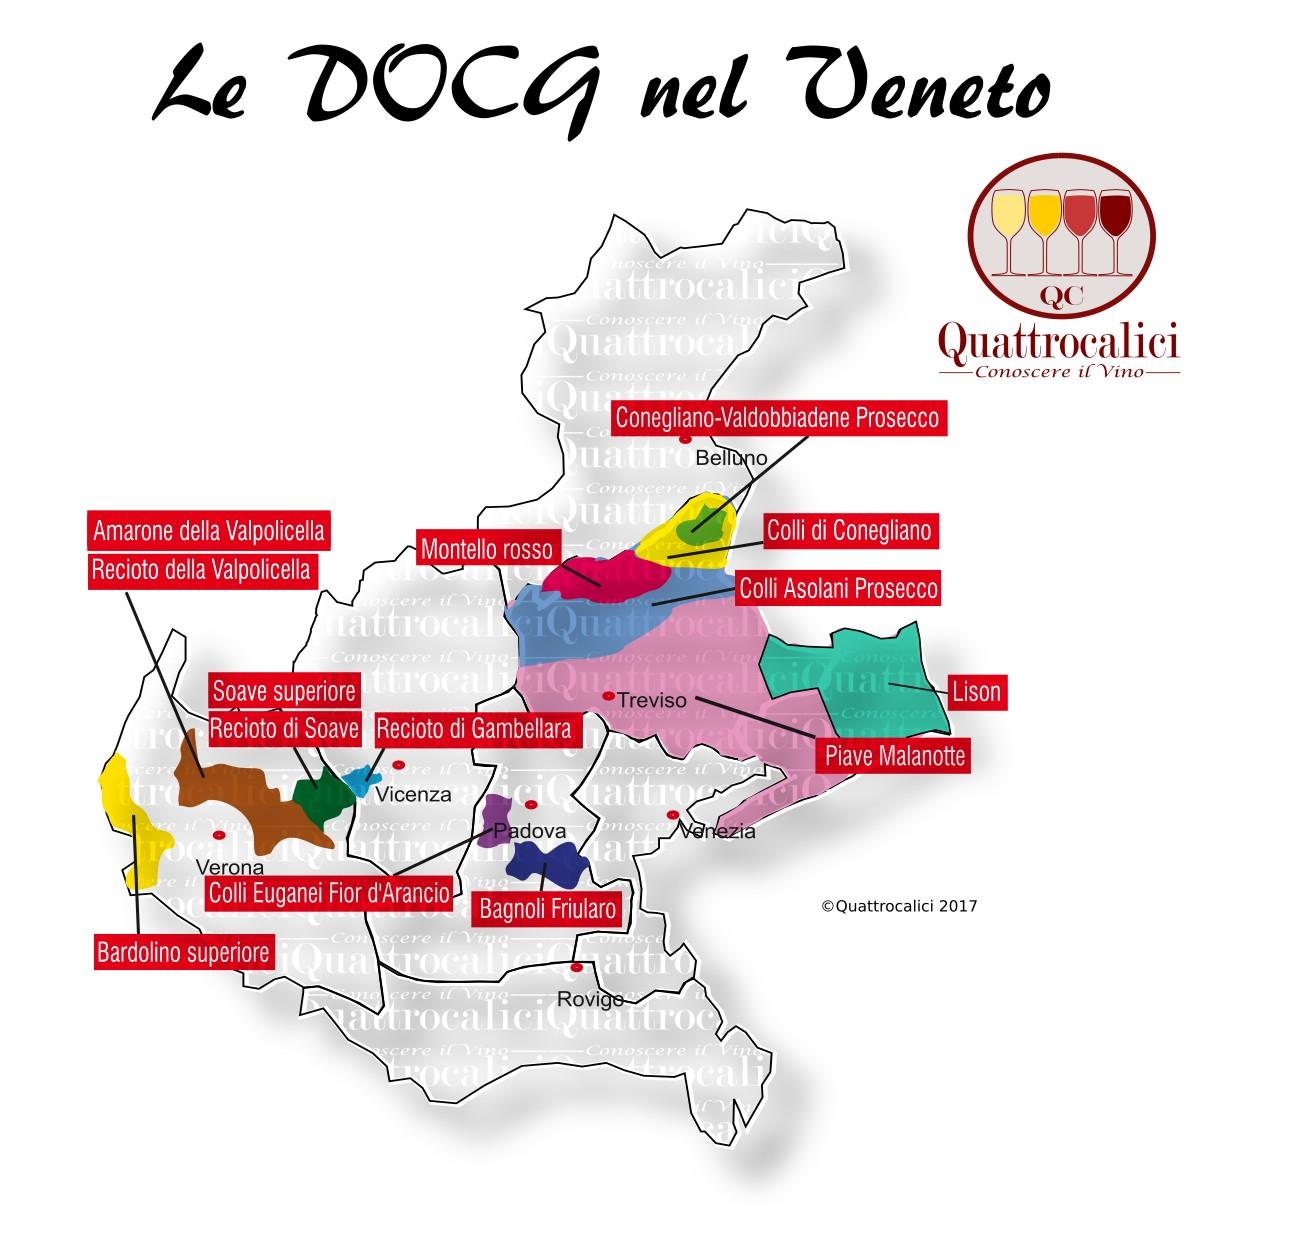 Le DOCG del Veneto